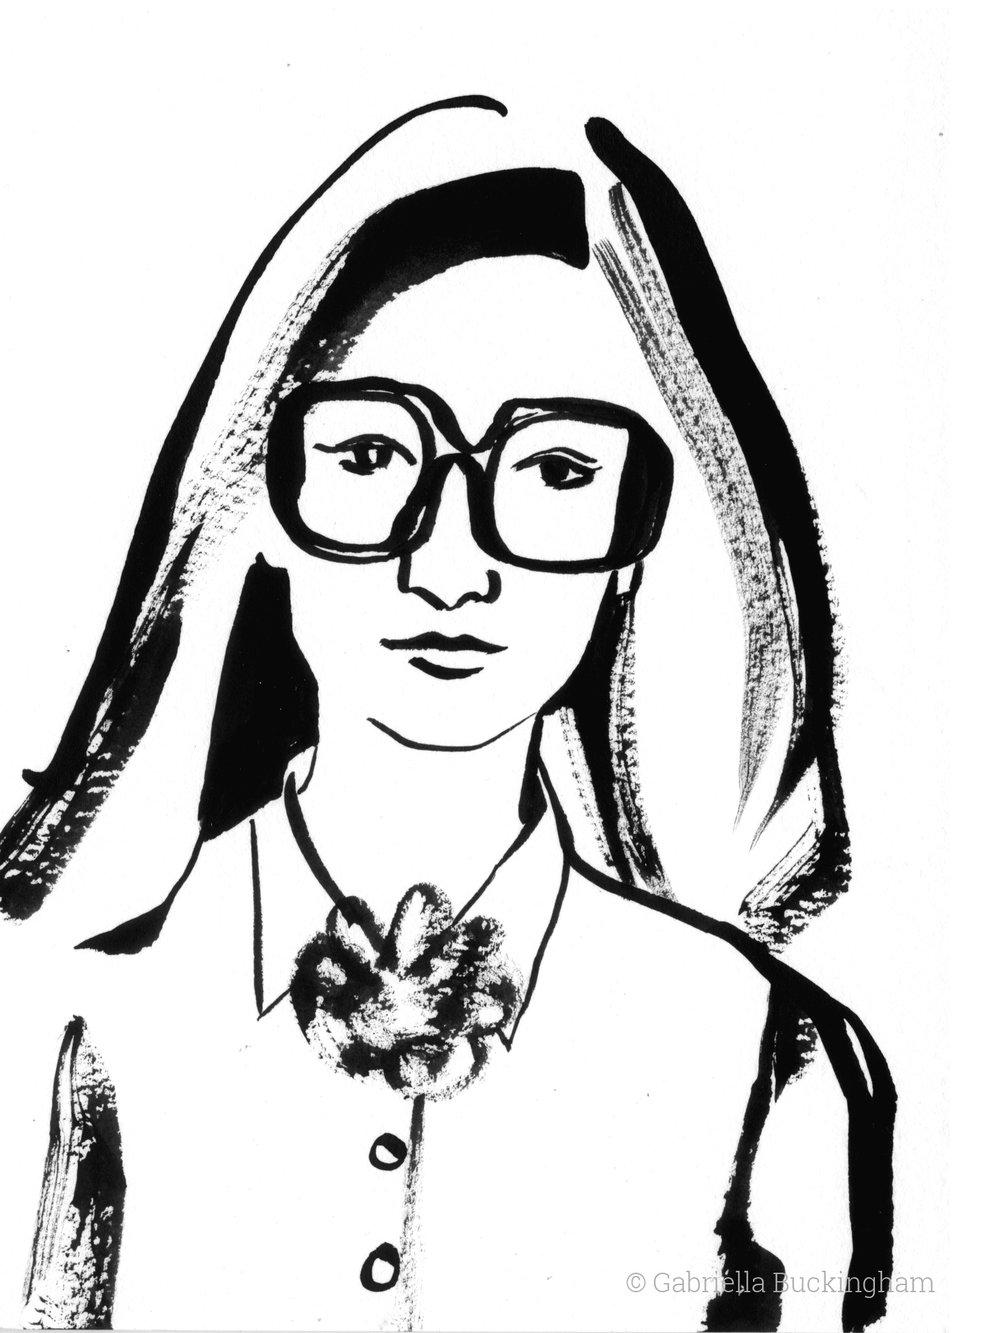 girl-with-glasses-ink-drawing-by-Gabriella-Buckingham.jpg